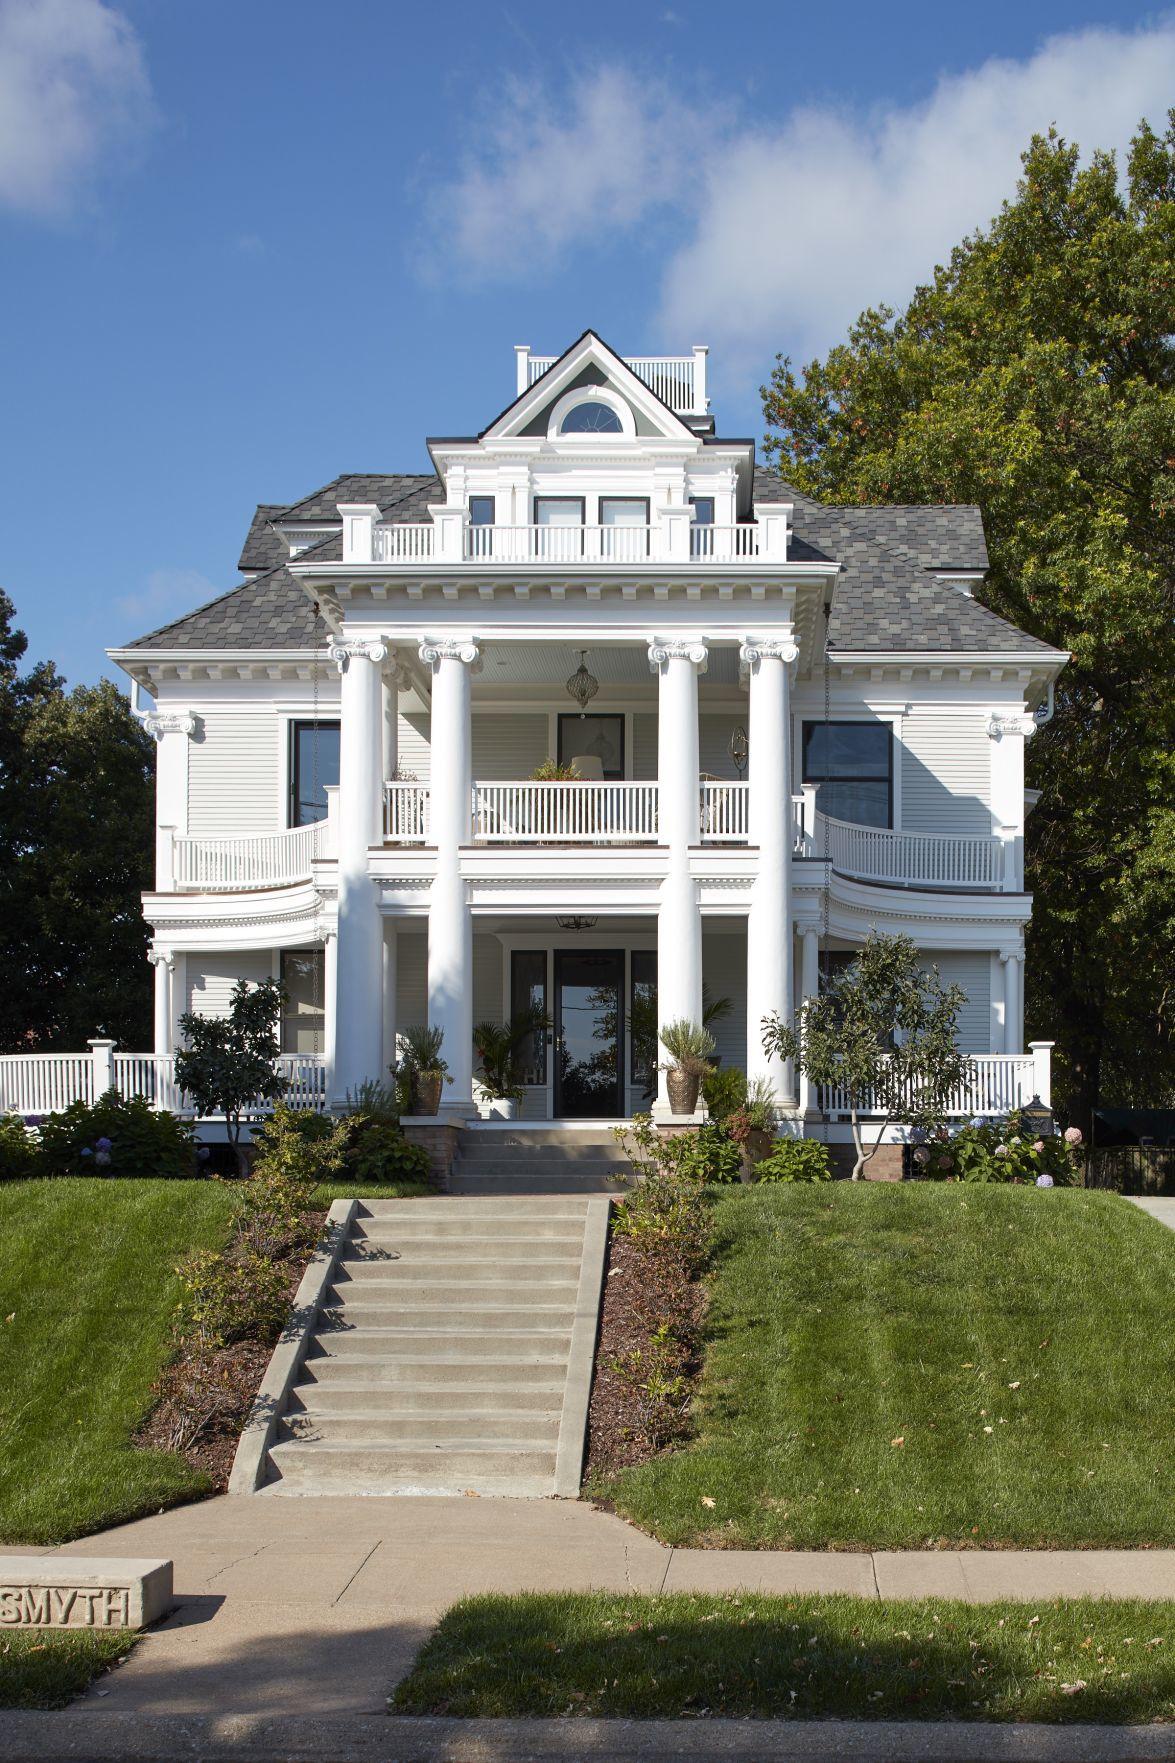 Smyth house